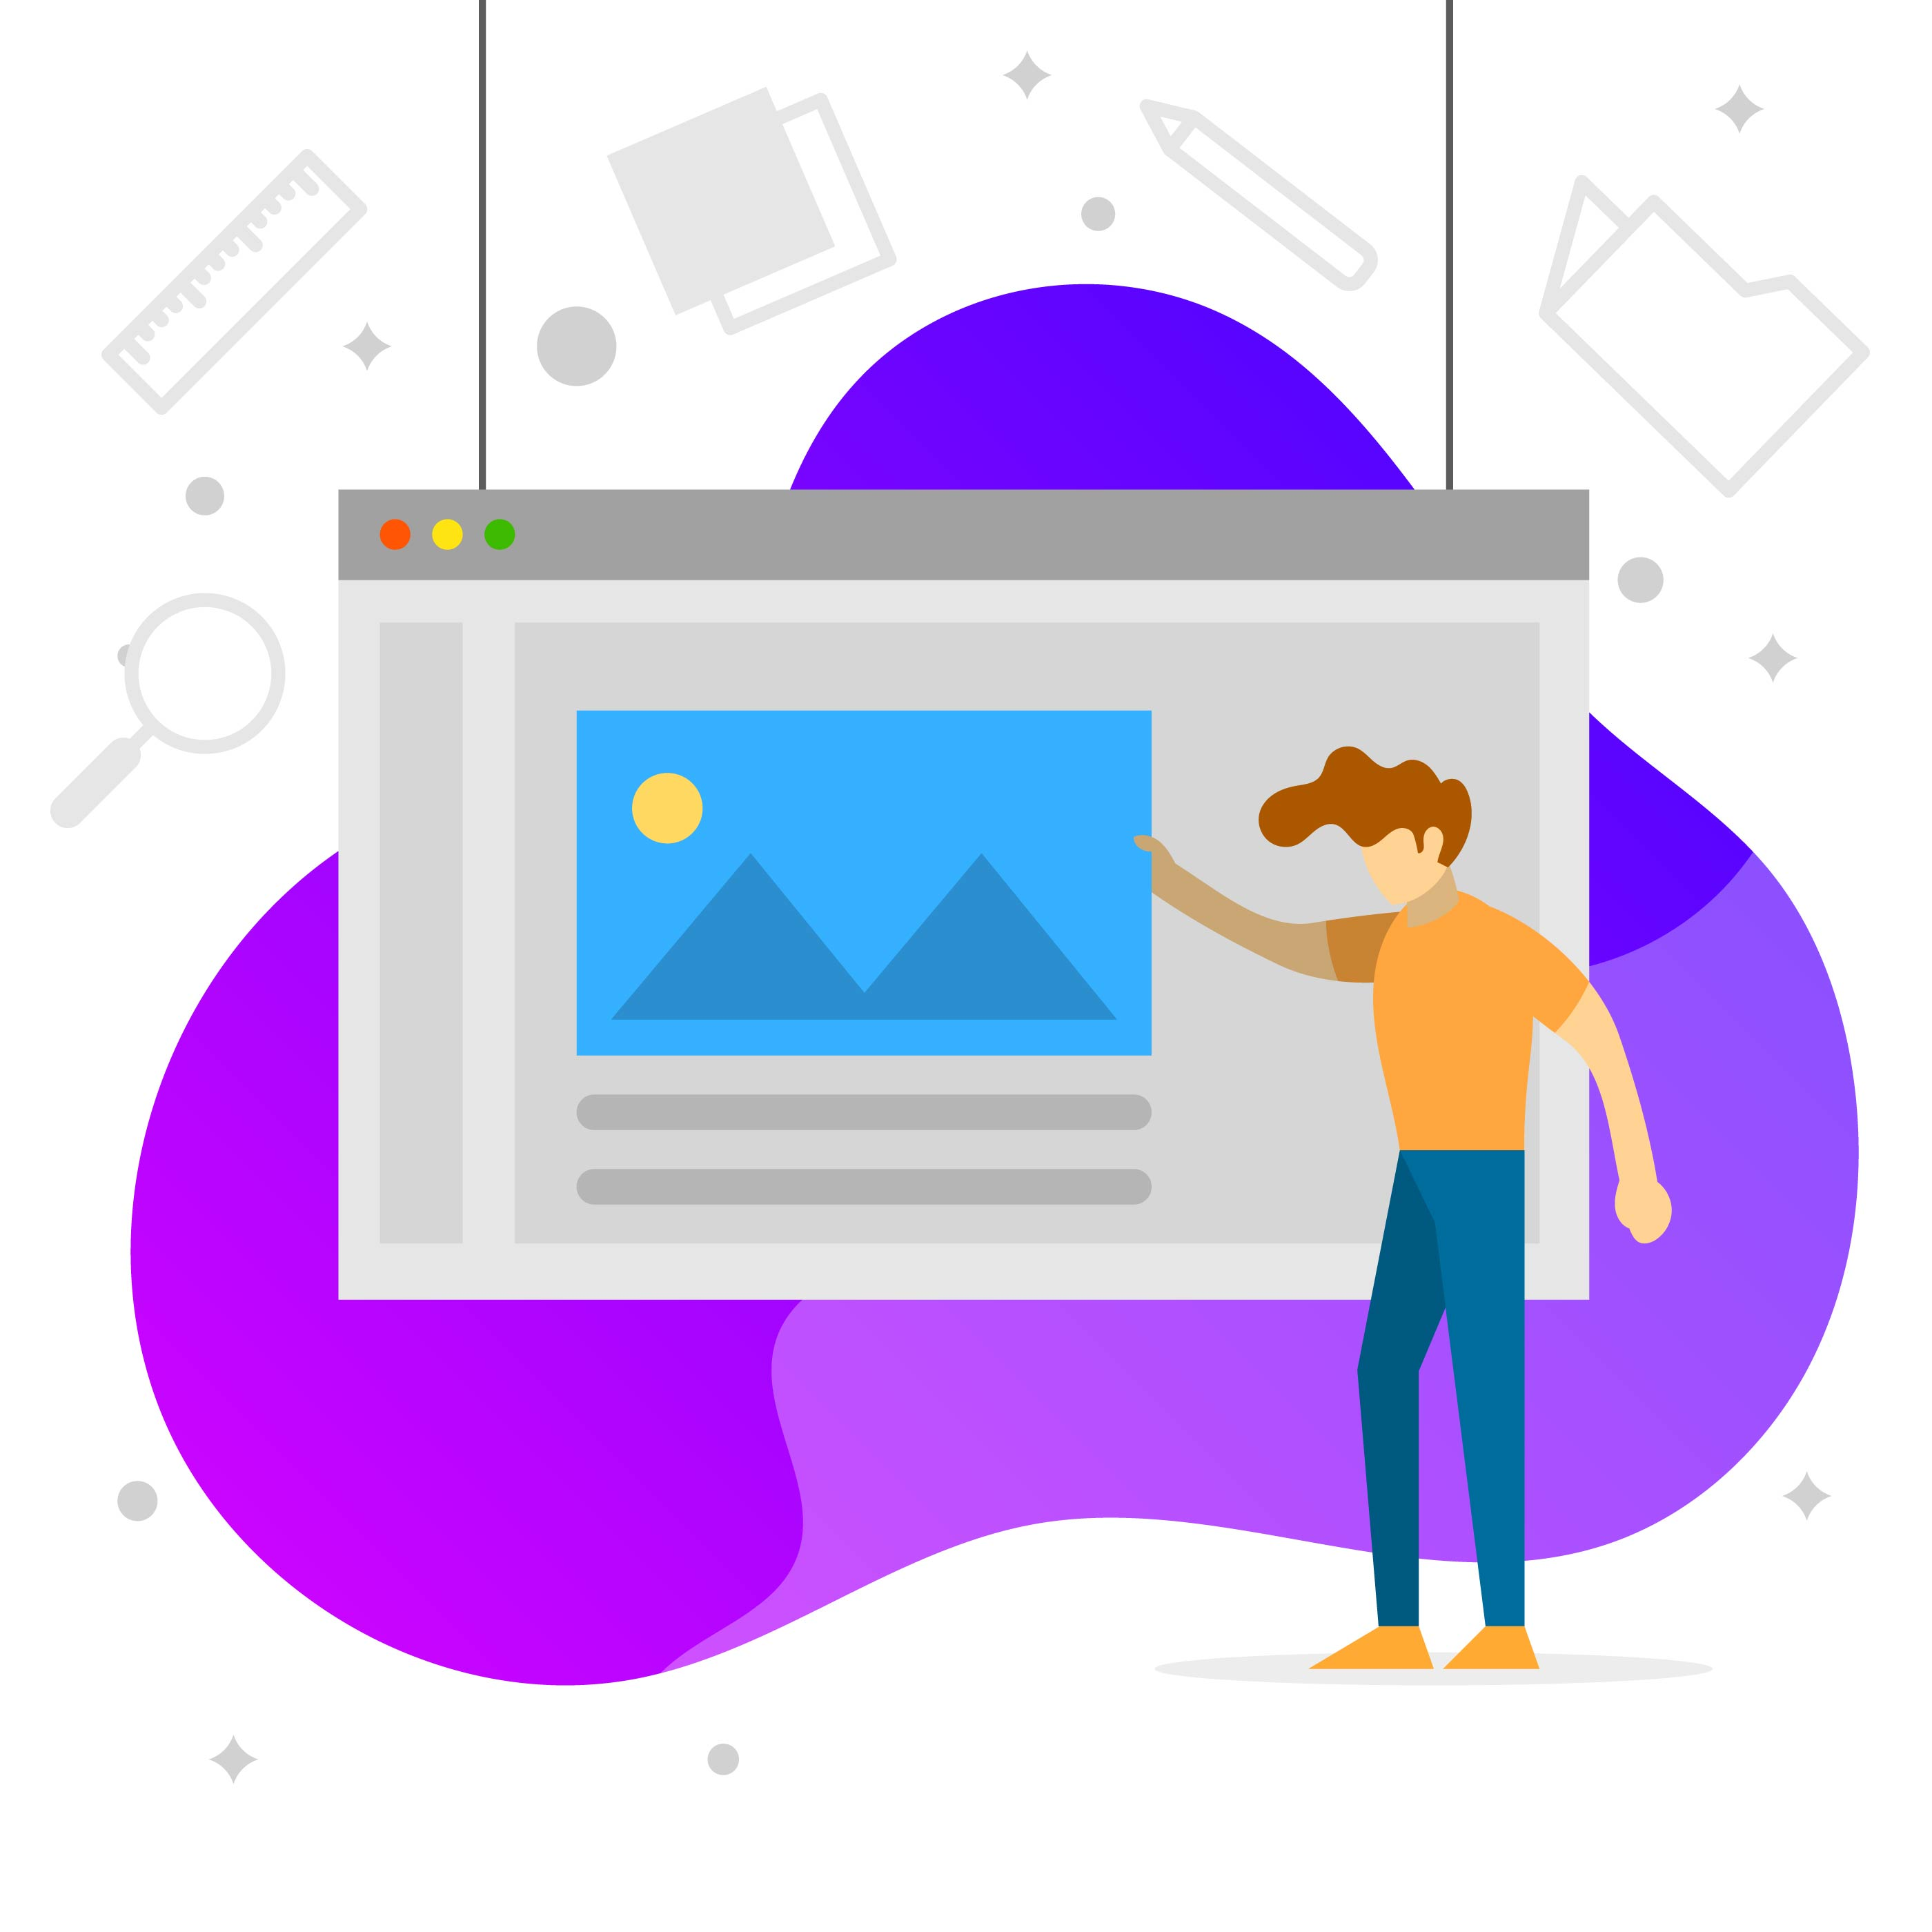 Flat Graphic Design Software Development Vector